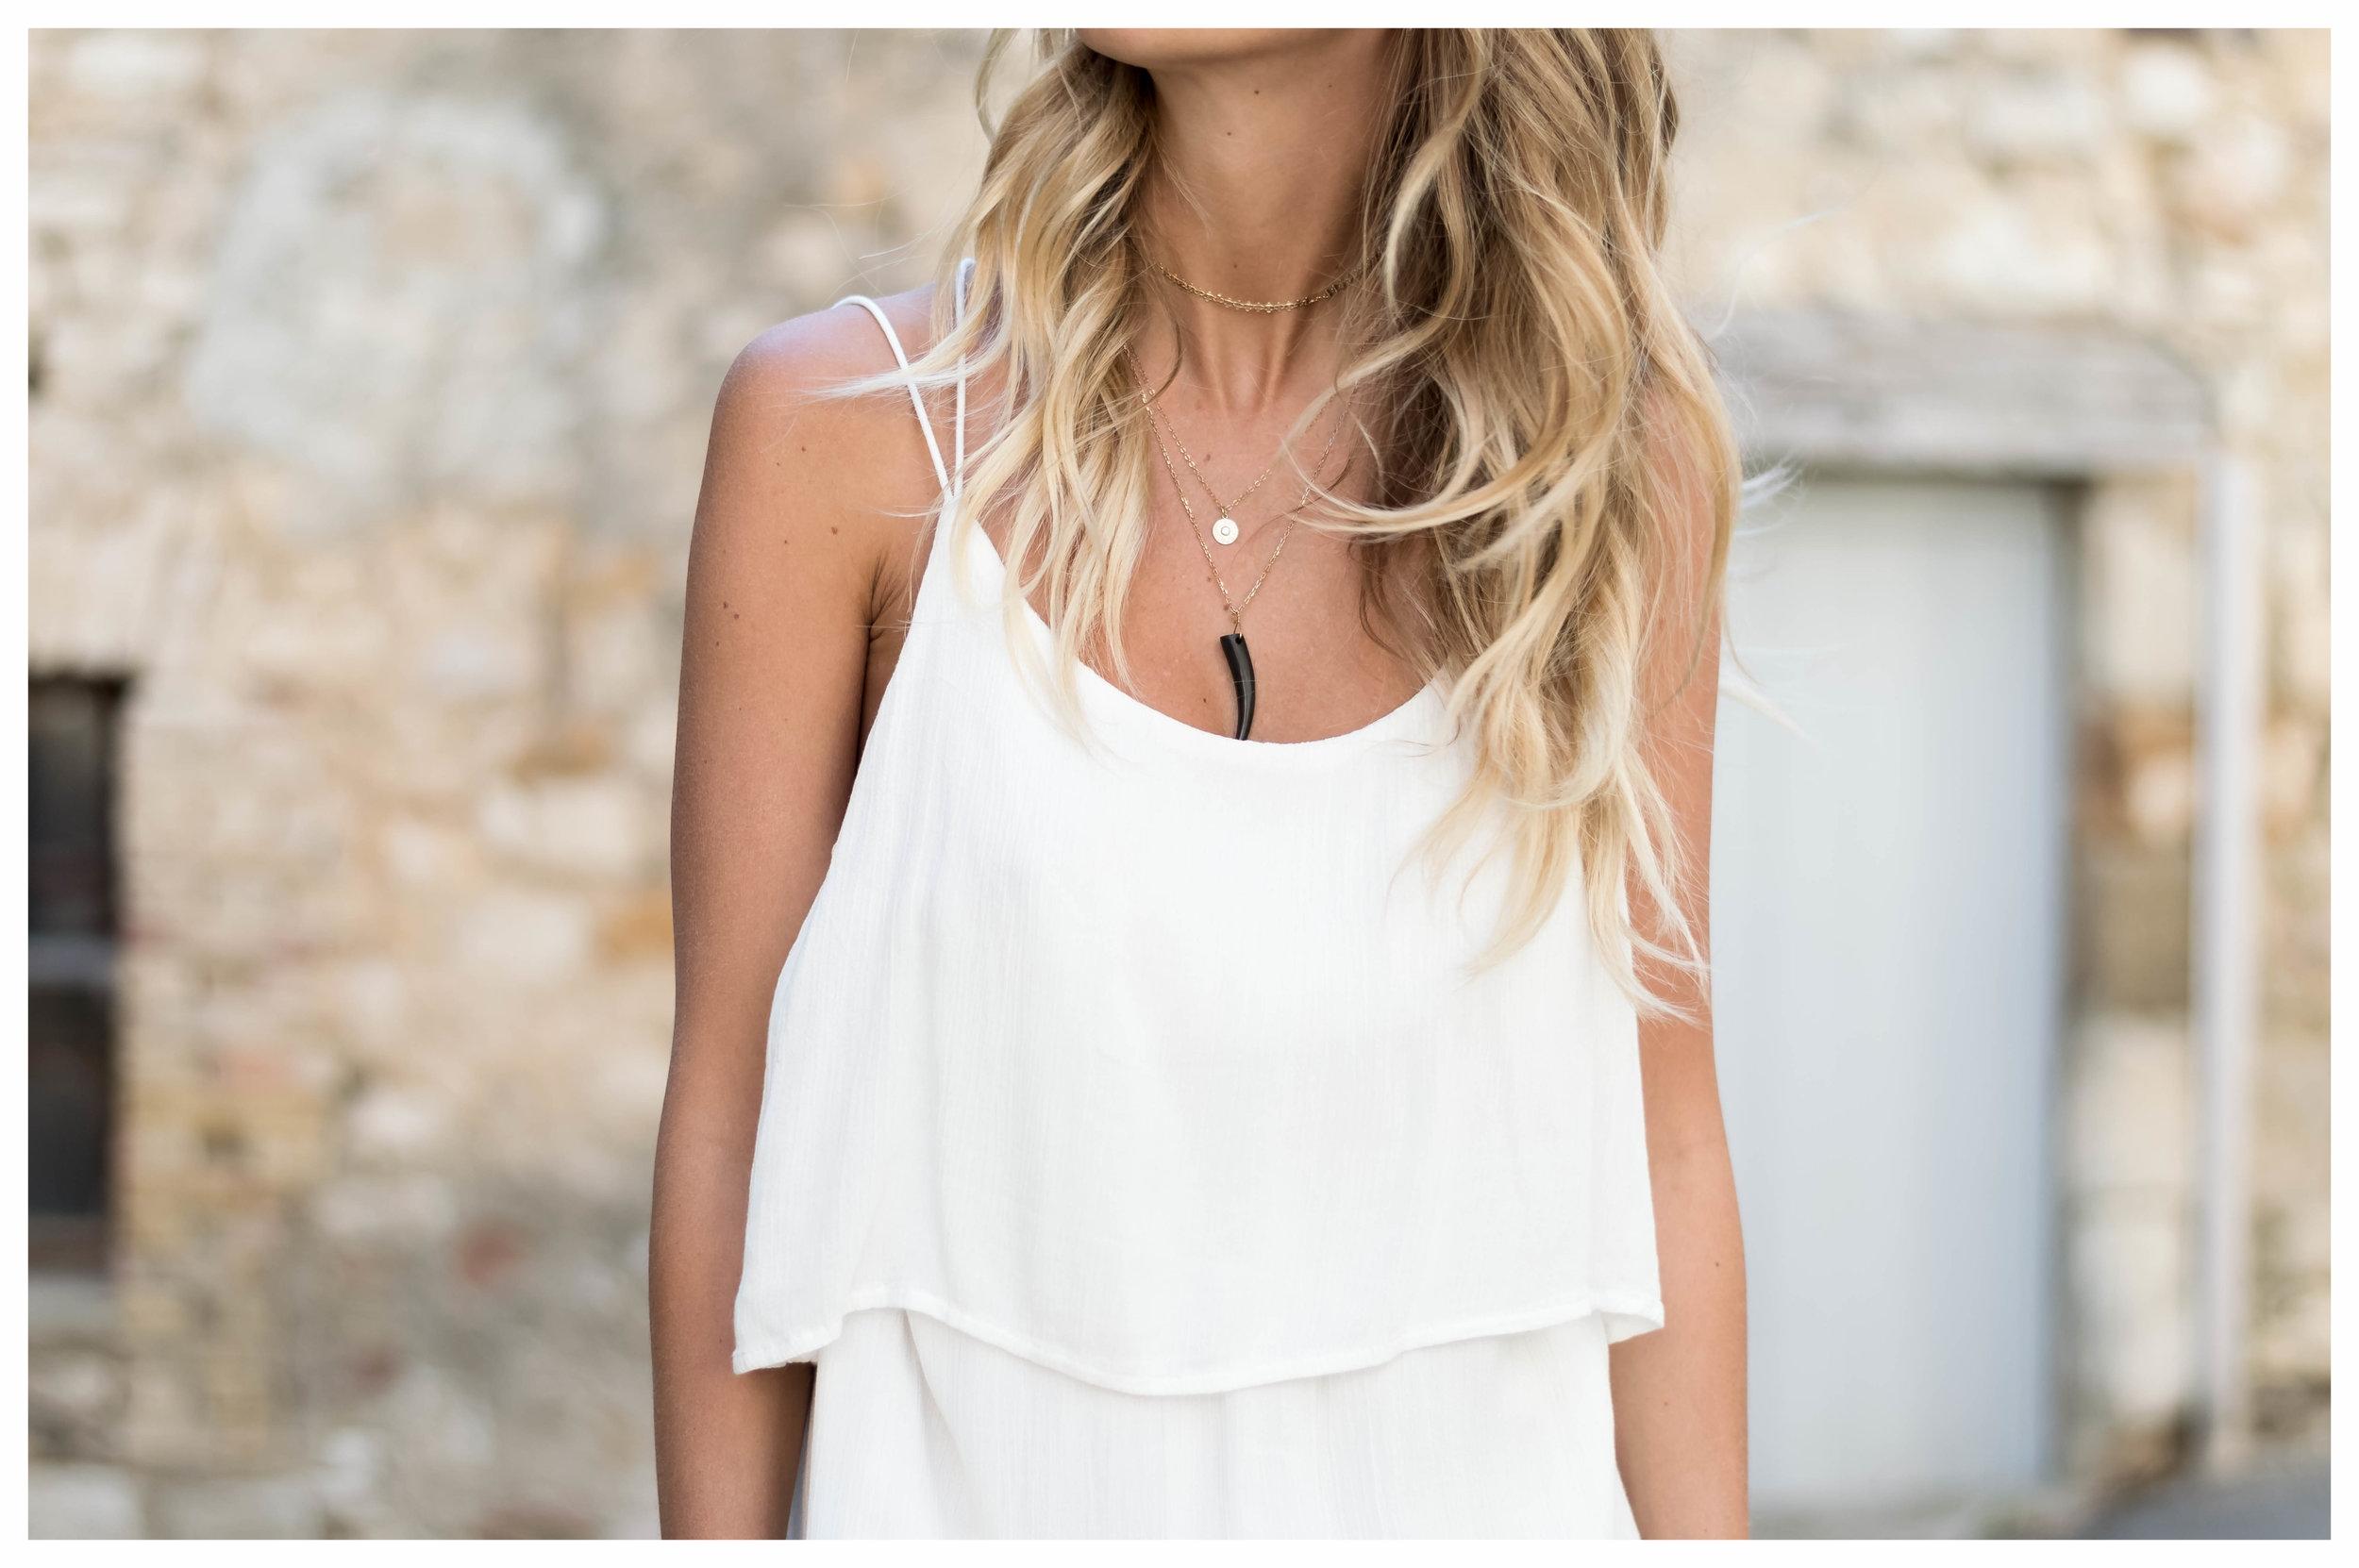 White Dress - OSIARAH.COM (15 sur 16).jpg